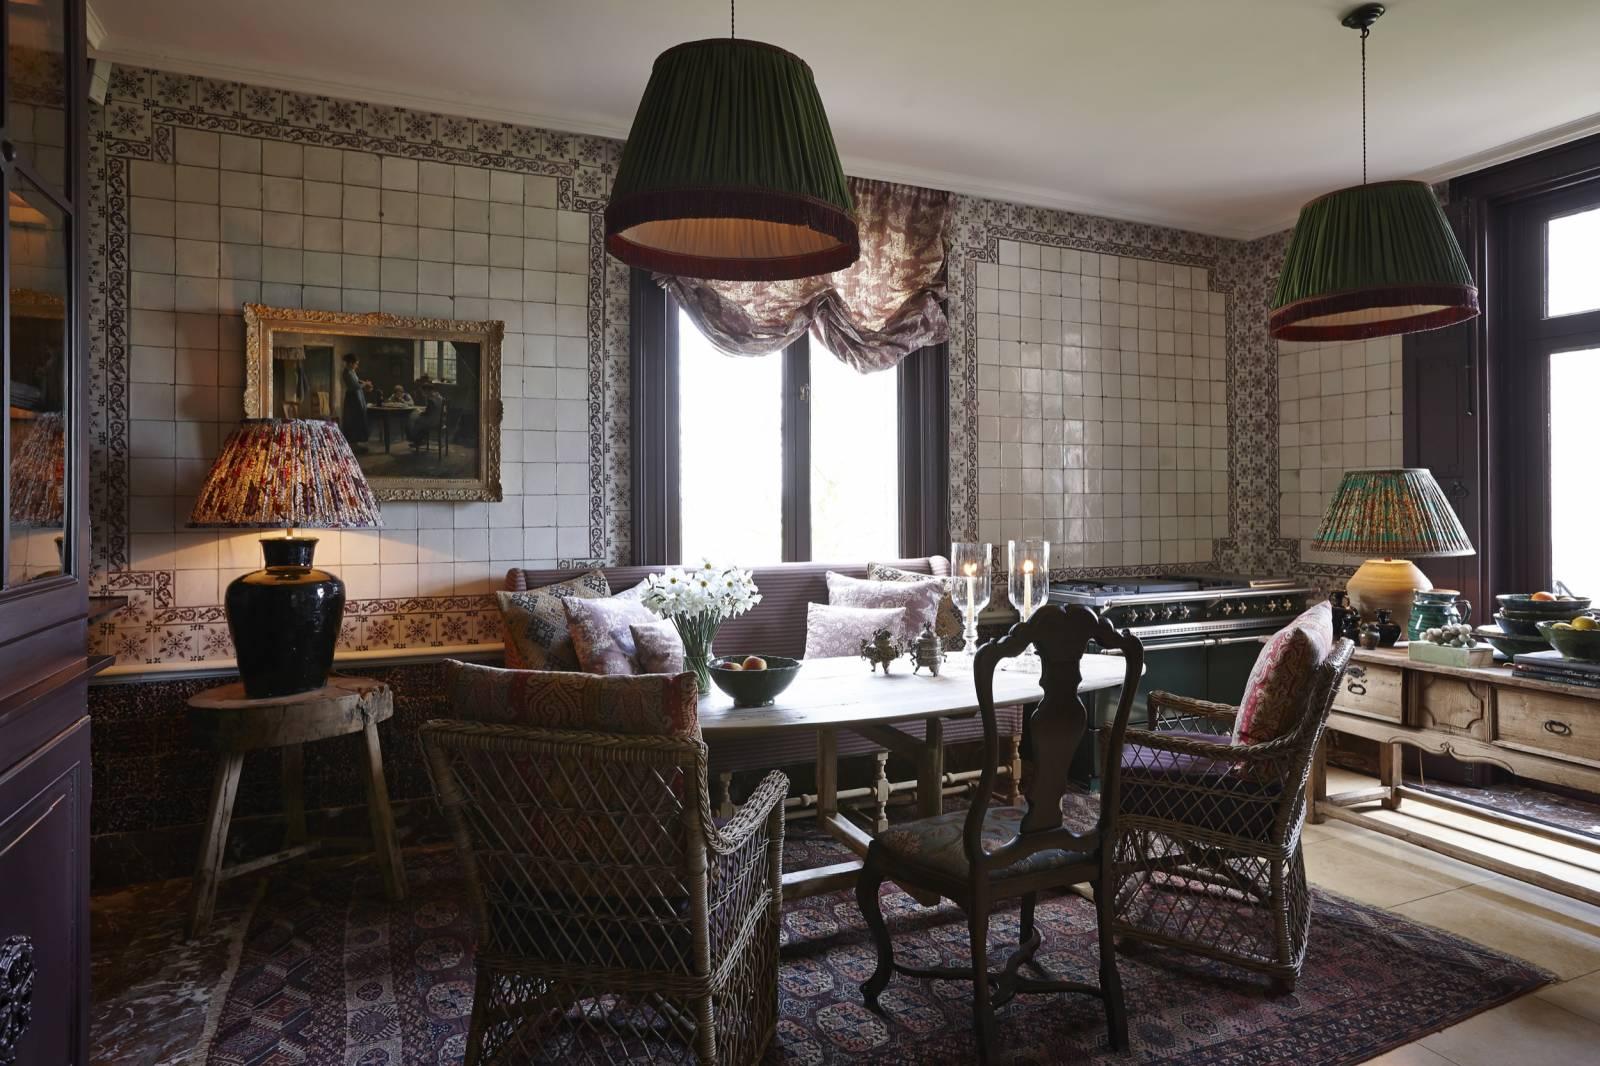 Chateau de Spycker - House of Weddings-06